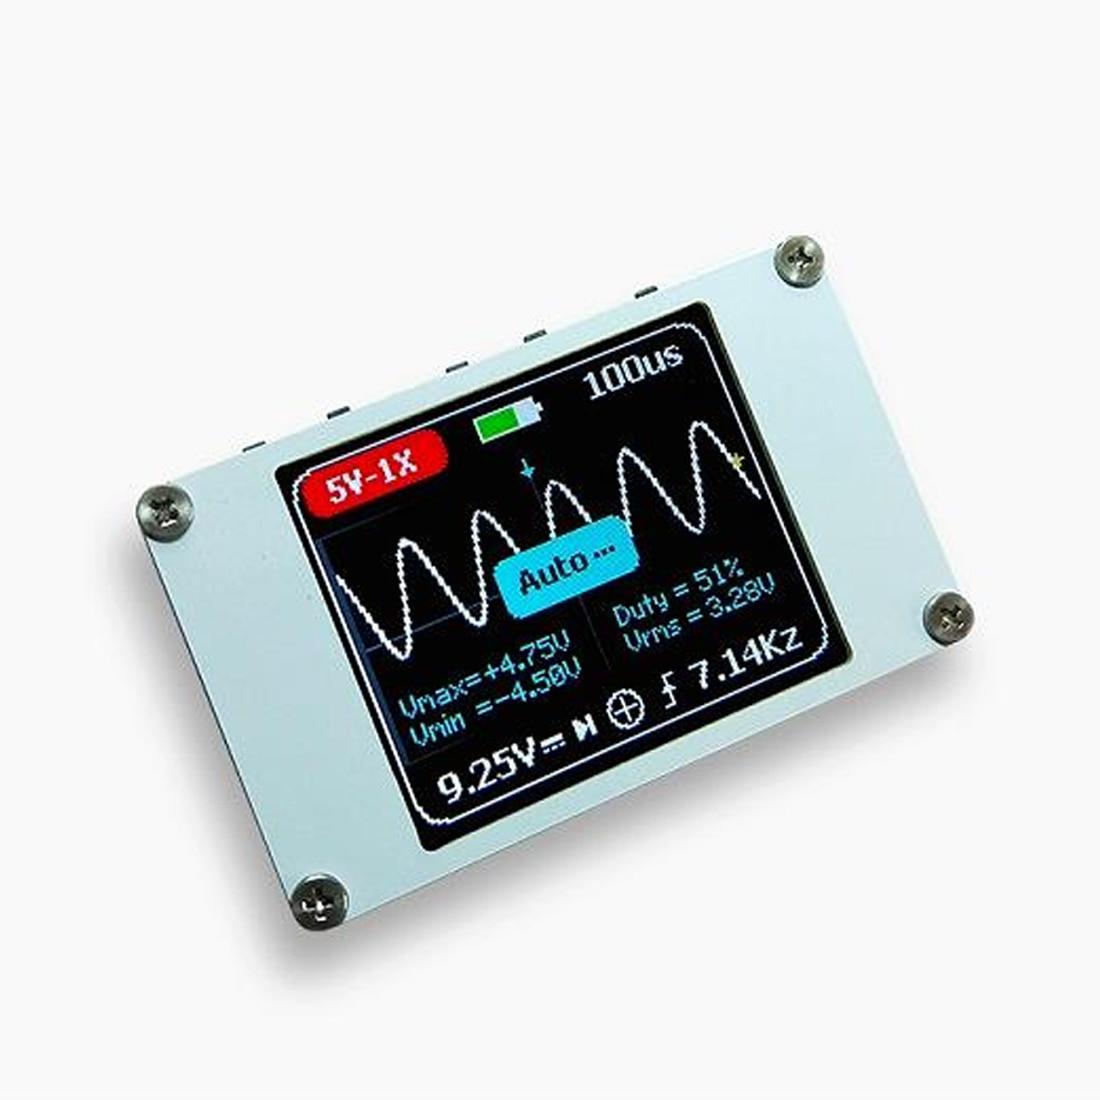 цена на Handheld 1M Bandwidth 5M Sample Rate Digital Oscilloscope Kit Mini Pocket Portable Ultra-small Digital Oscilloscope